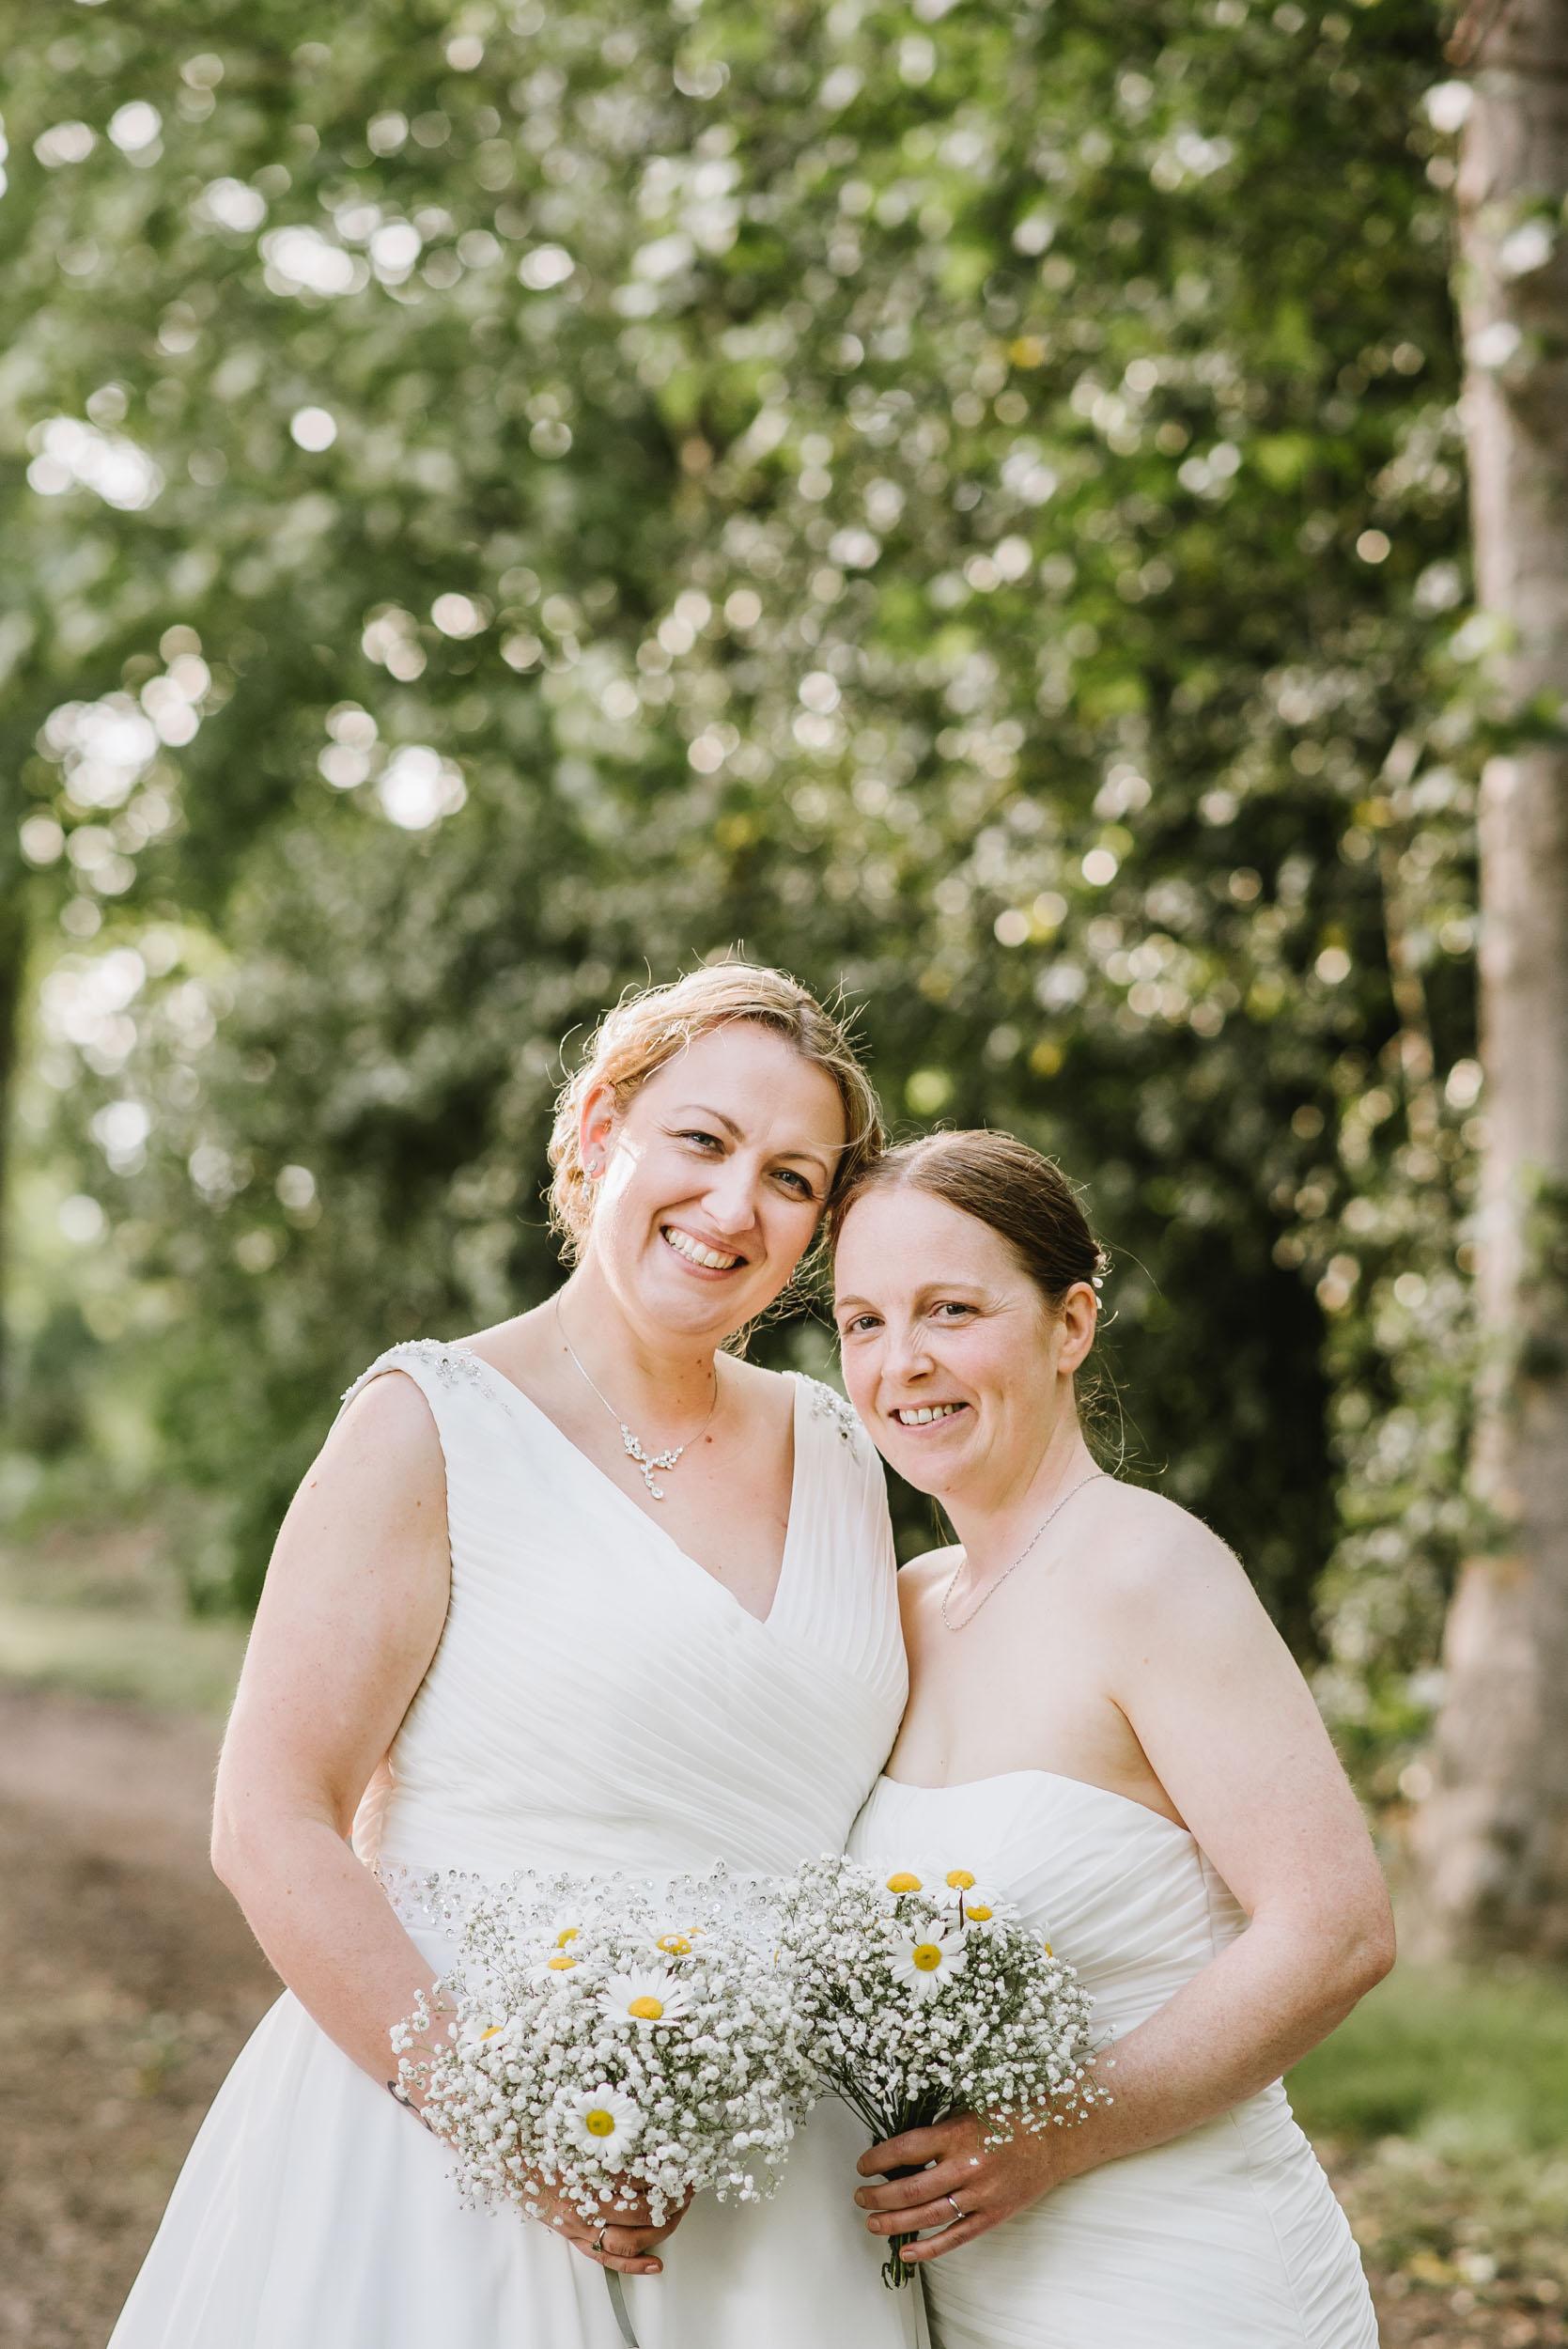 Donington-park-farm-wedding-photography-551.jpg